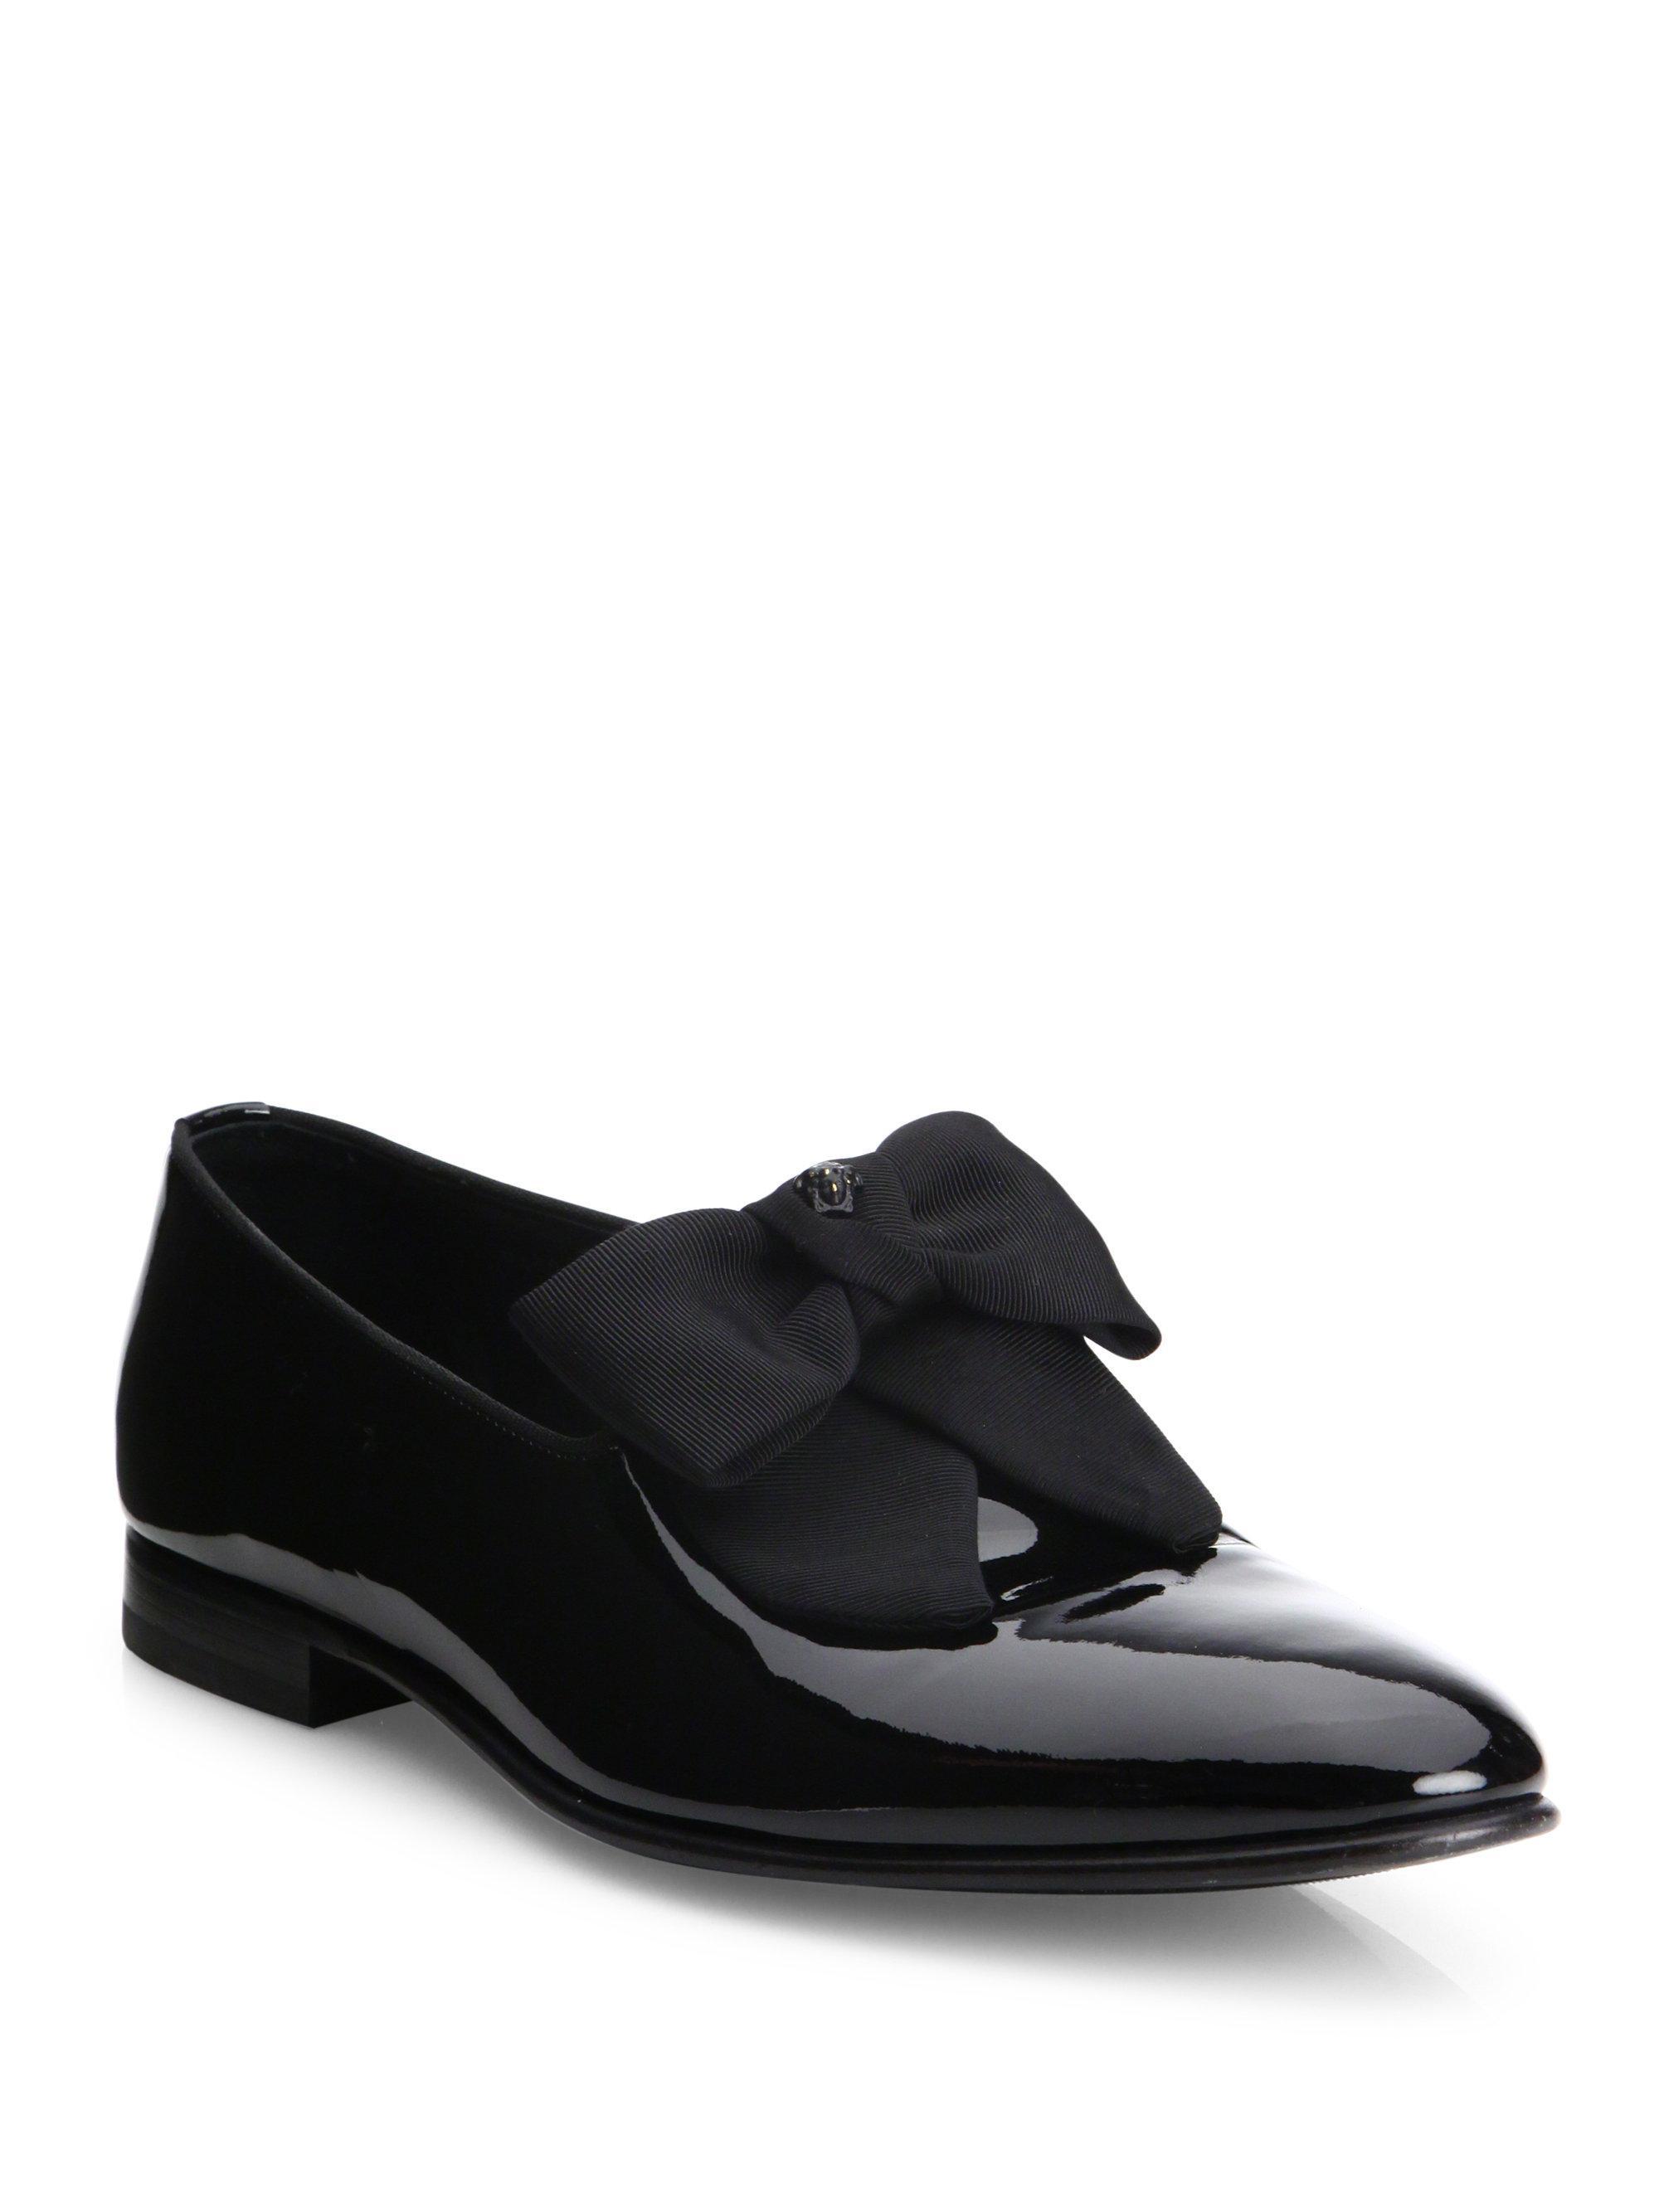 Lyst  Versace Bow Trimmed Dress Shoe in Black for Men